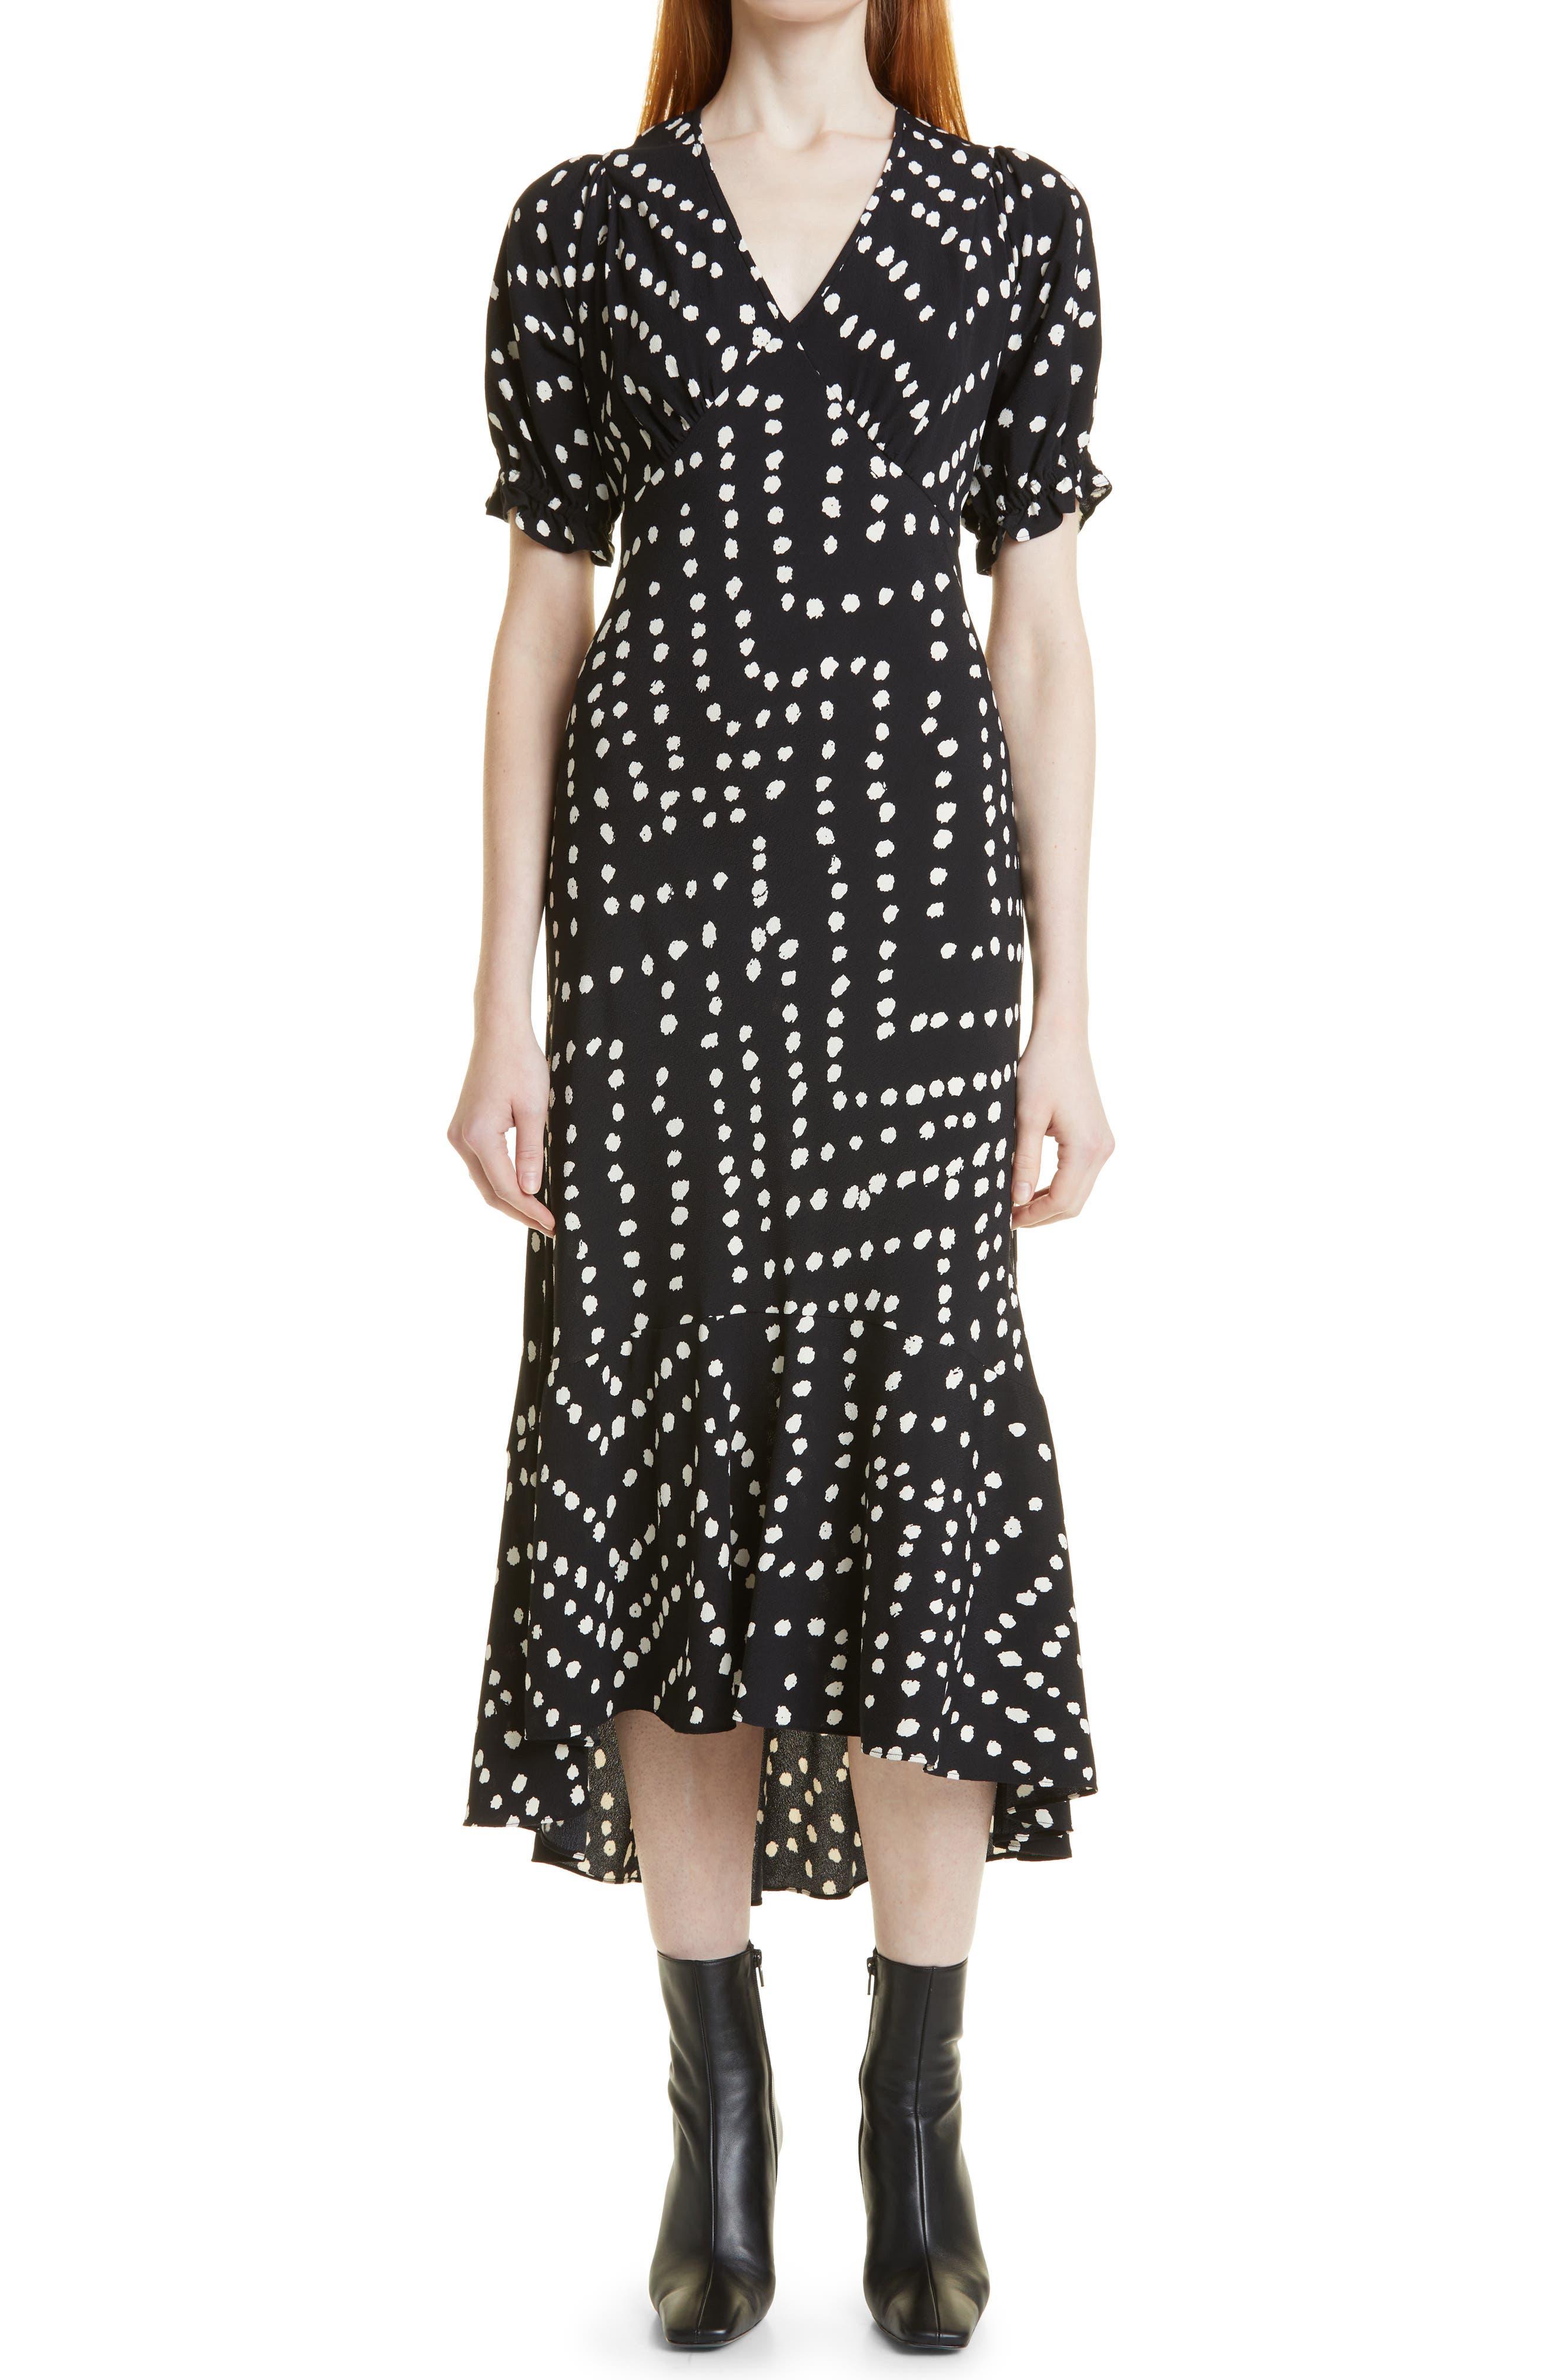 Orla Puff Sleeve Dress